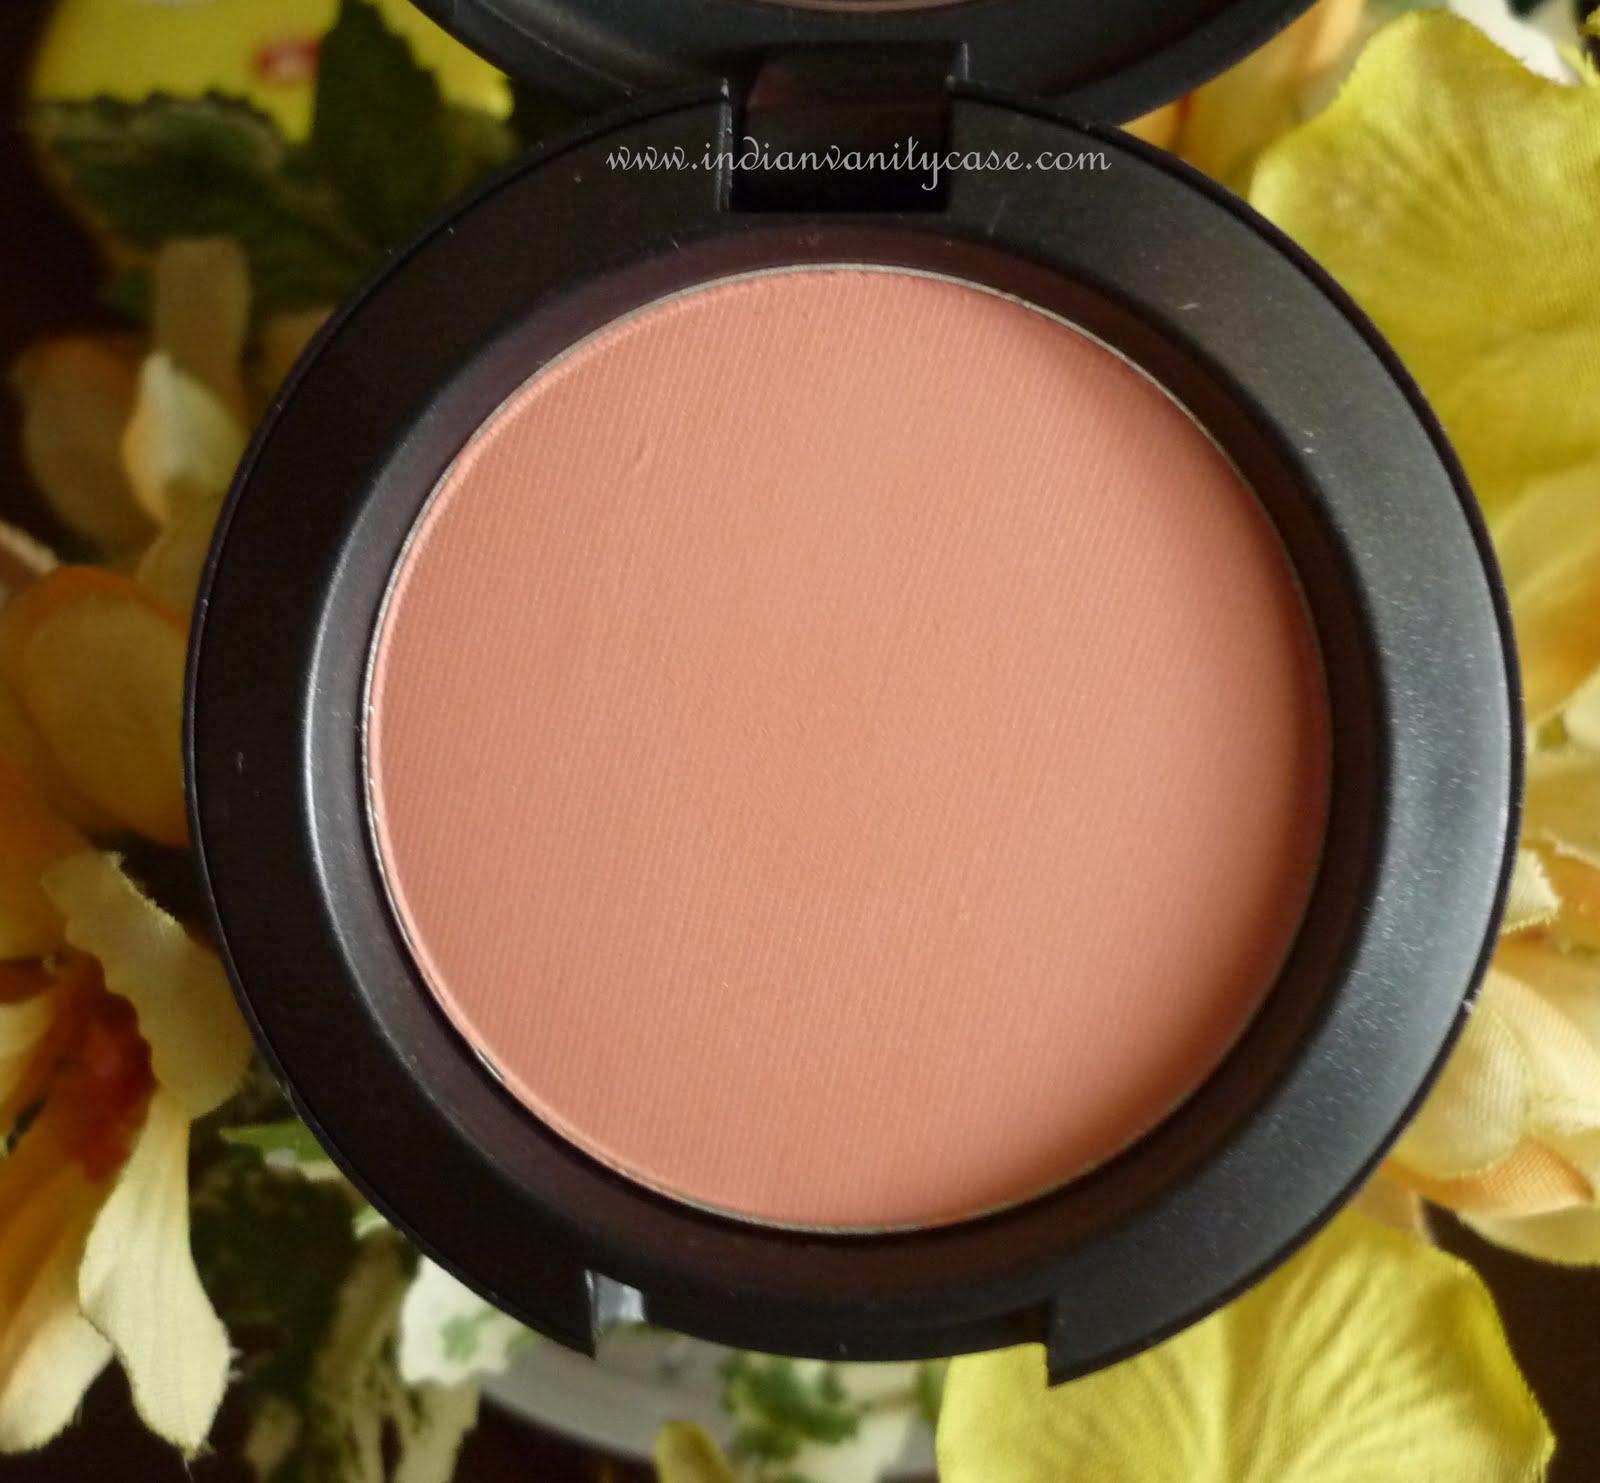 Indian Vanity Case: Mac Sheertone Peaches Blush Swatch & Review